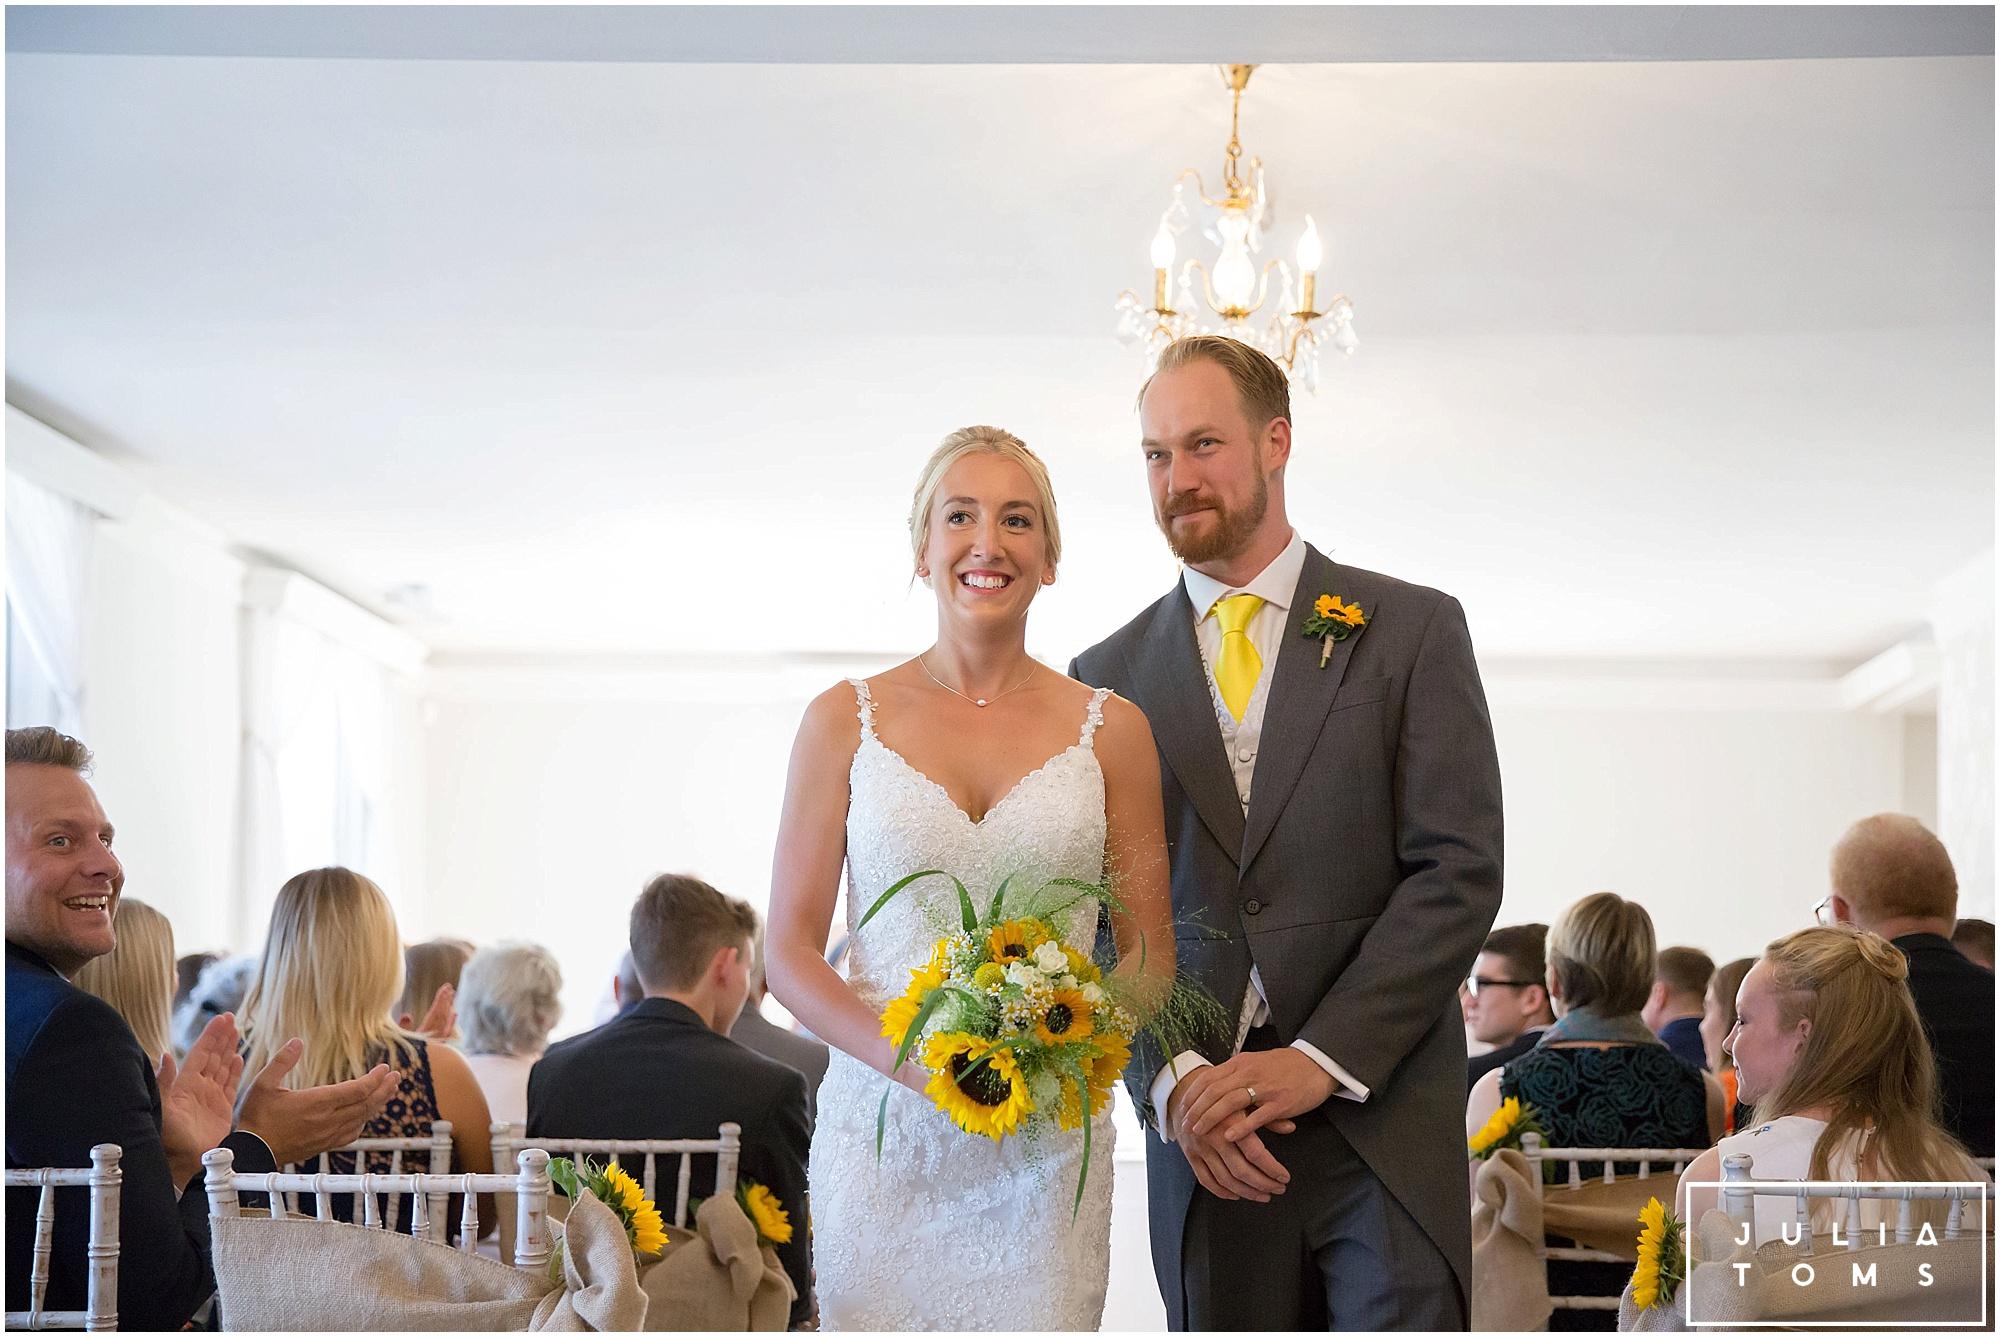 julia_toms_chichester_wedding_photographer_worthing_043.jpg